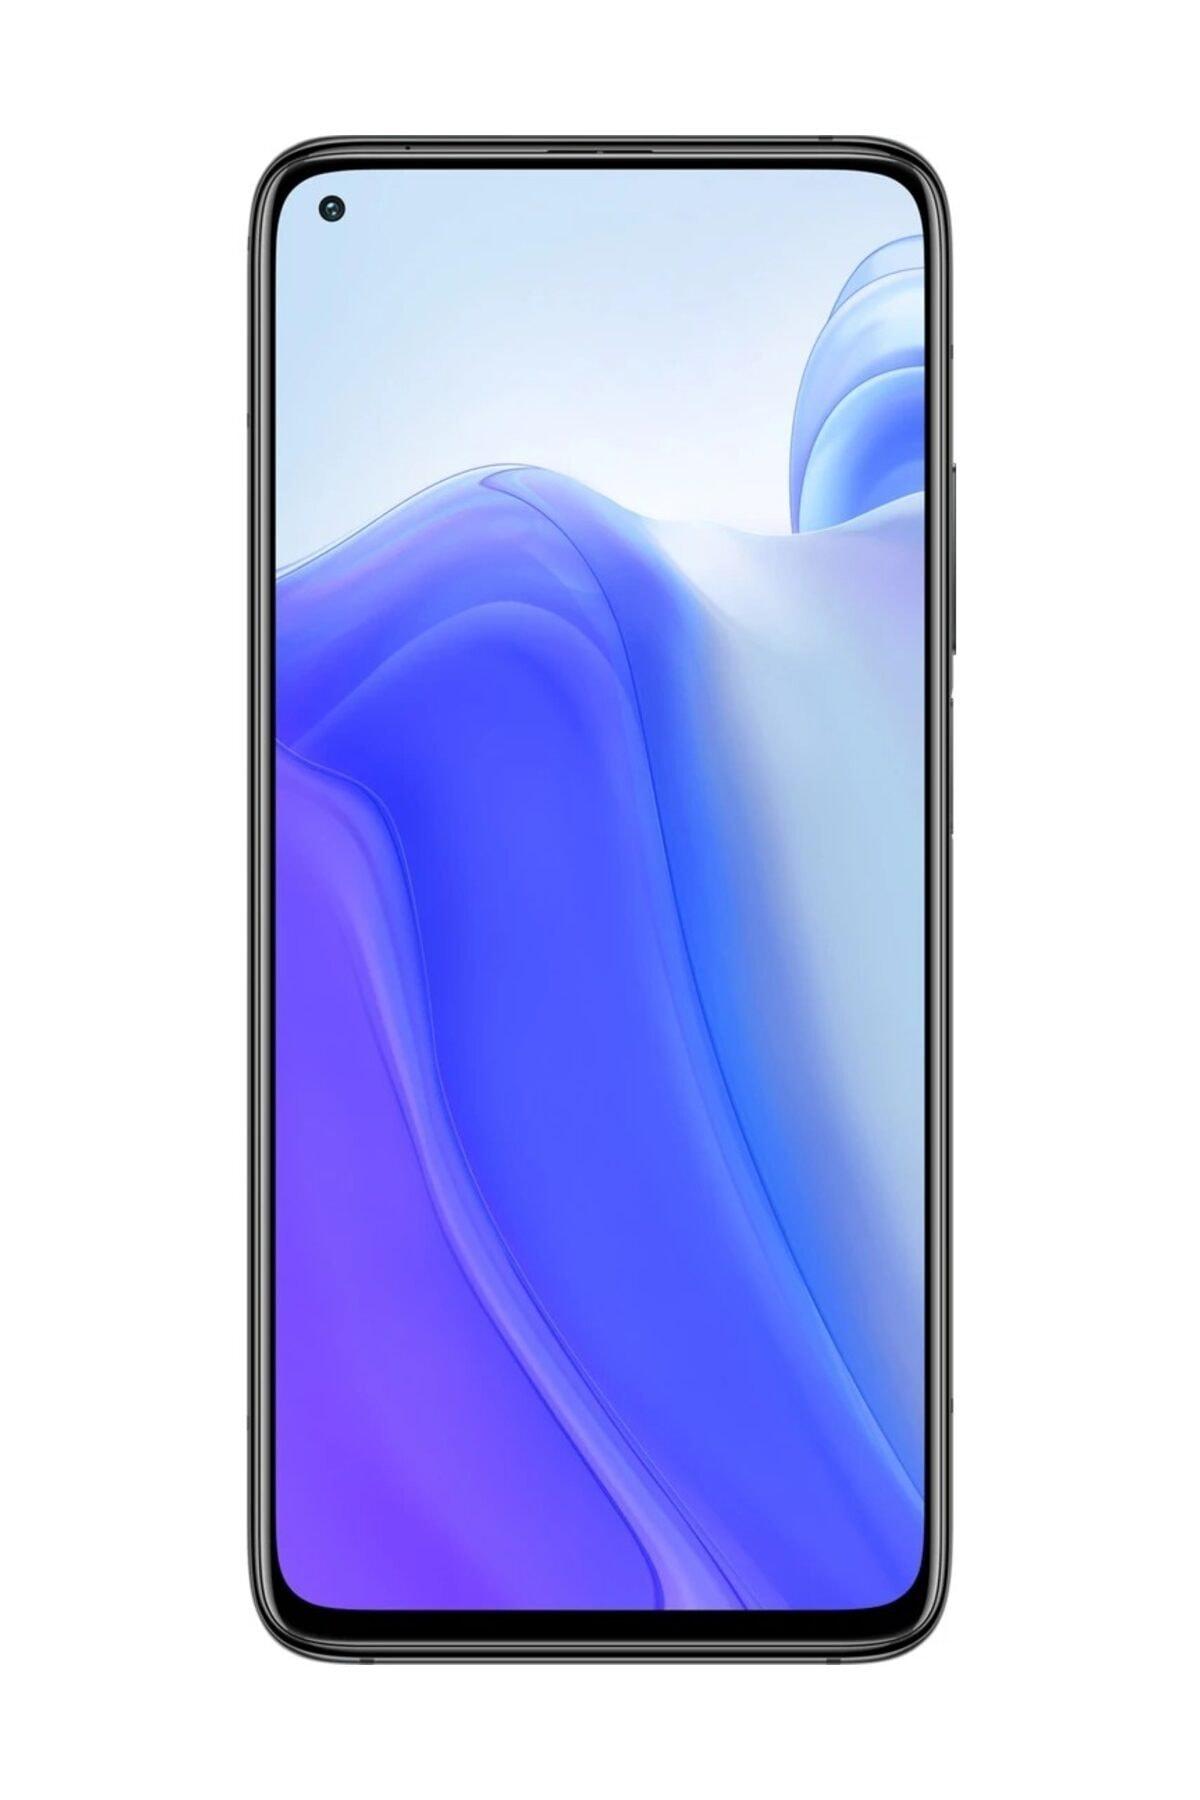 Xiaomi Mi 10T 5G 8GB + 128 GB Siyah Cep Telefonu (Xiaomi Türkiye Garantili) 2